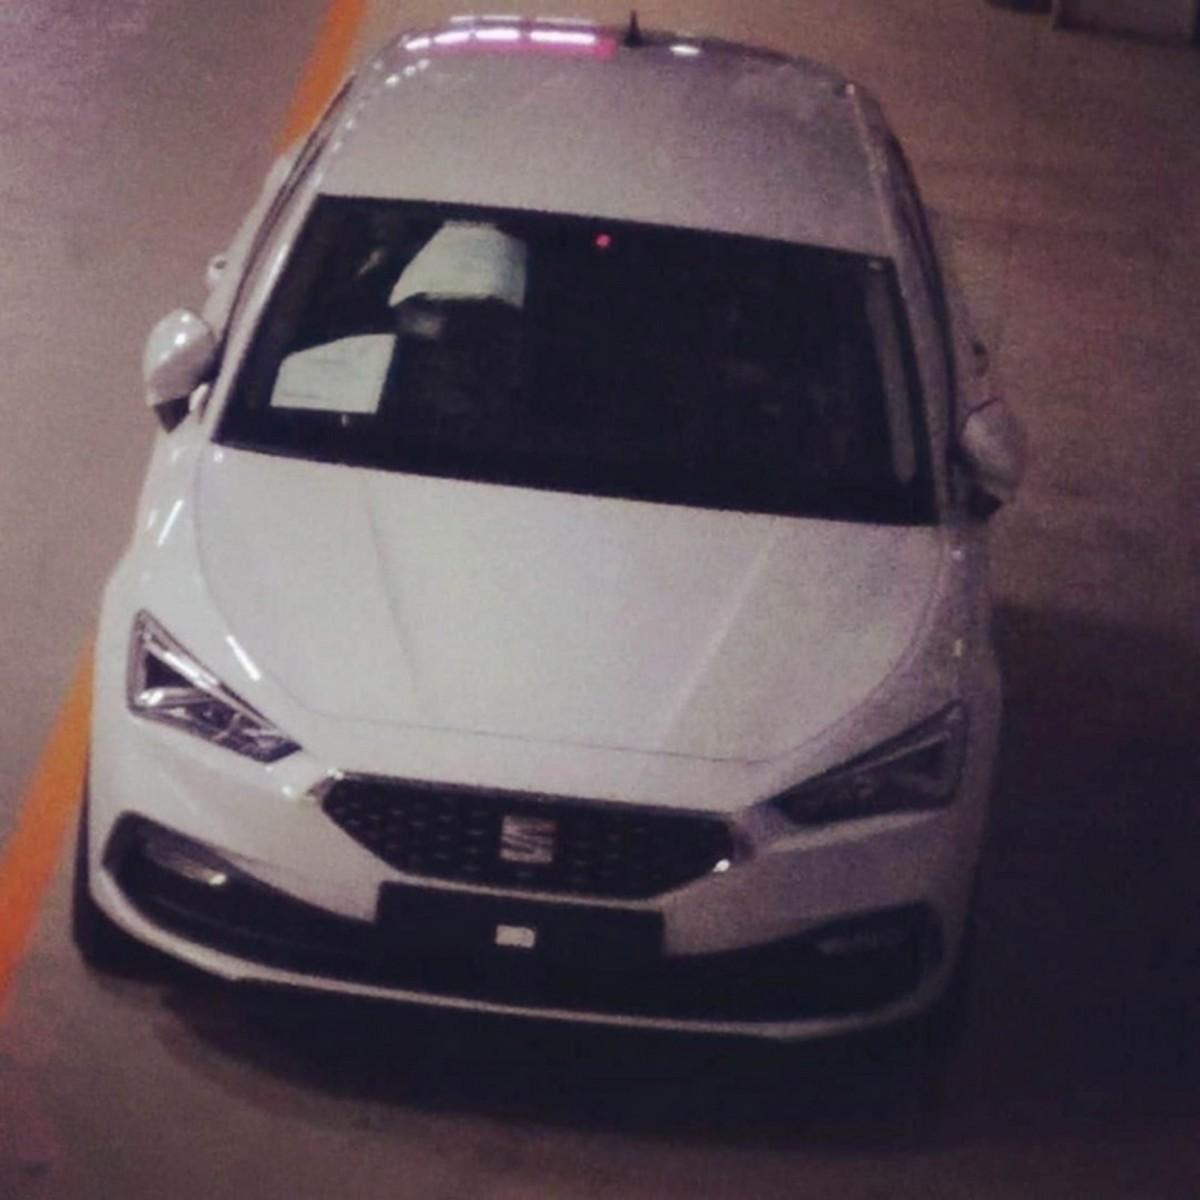 Seat Leon 2020 - Foto leaked